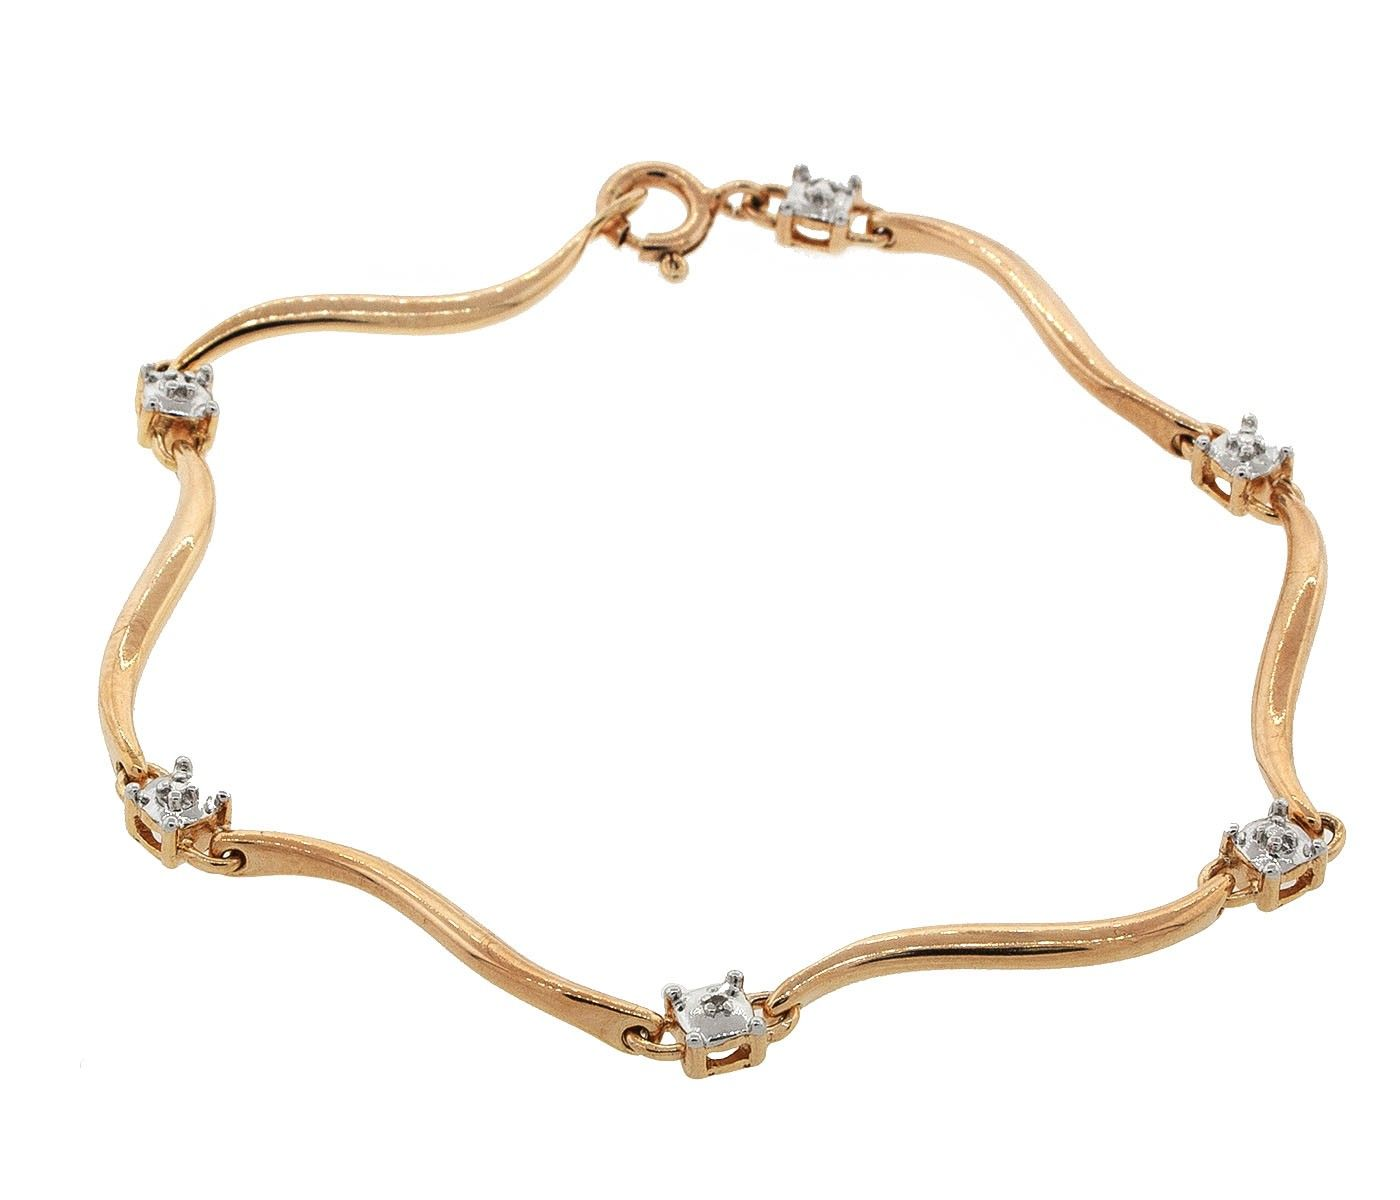 K gold ptd sterling silver diamond accent tennis bracelet